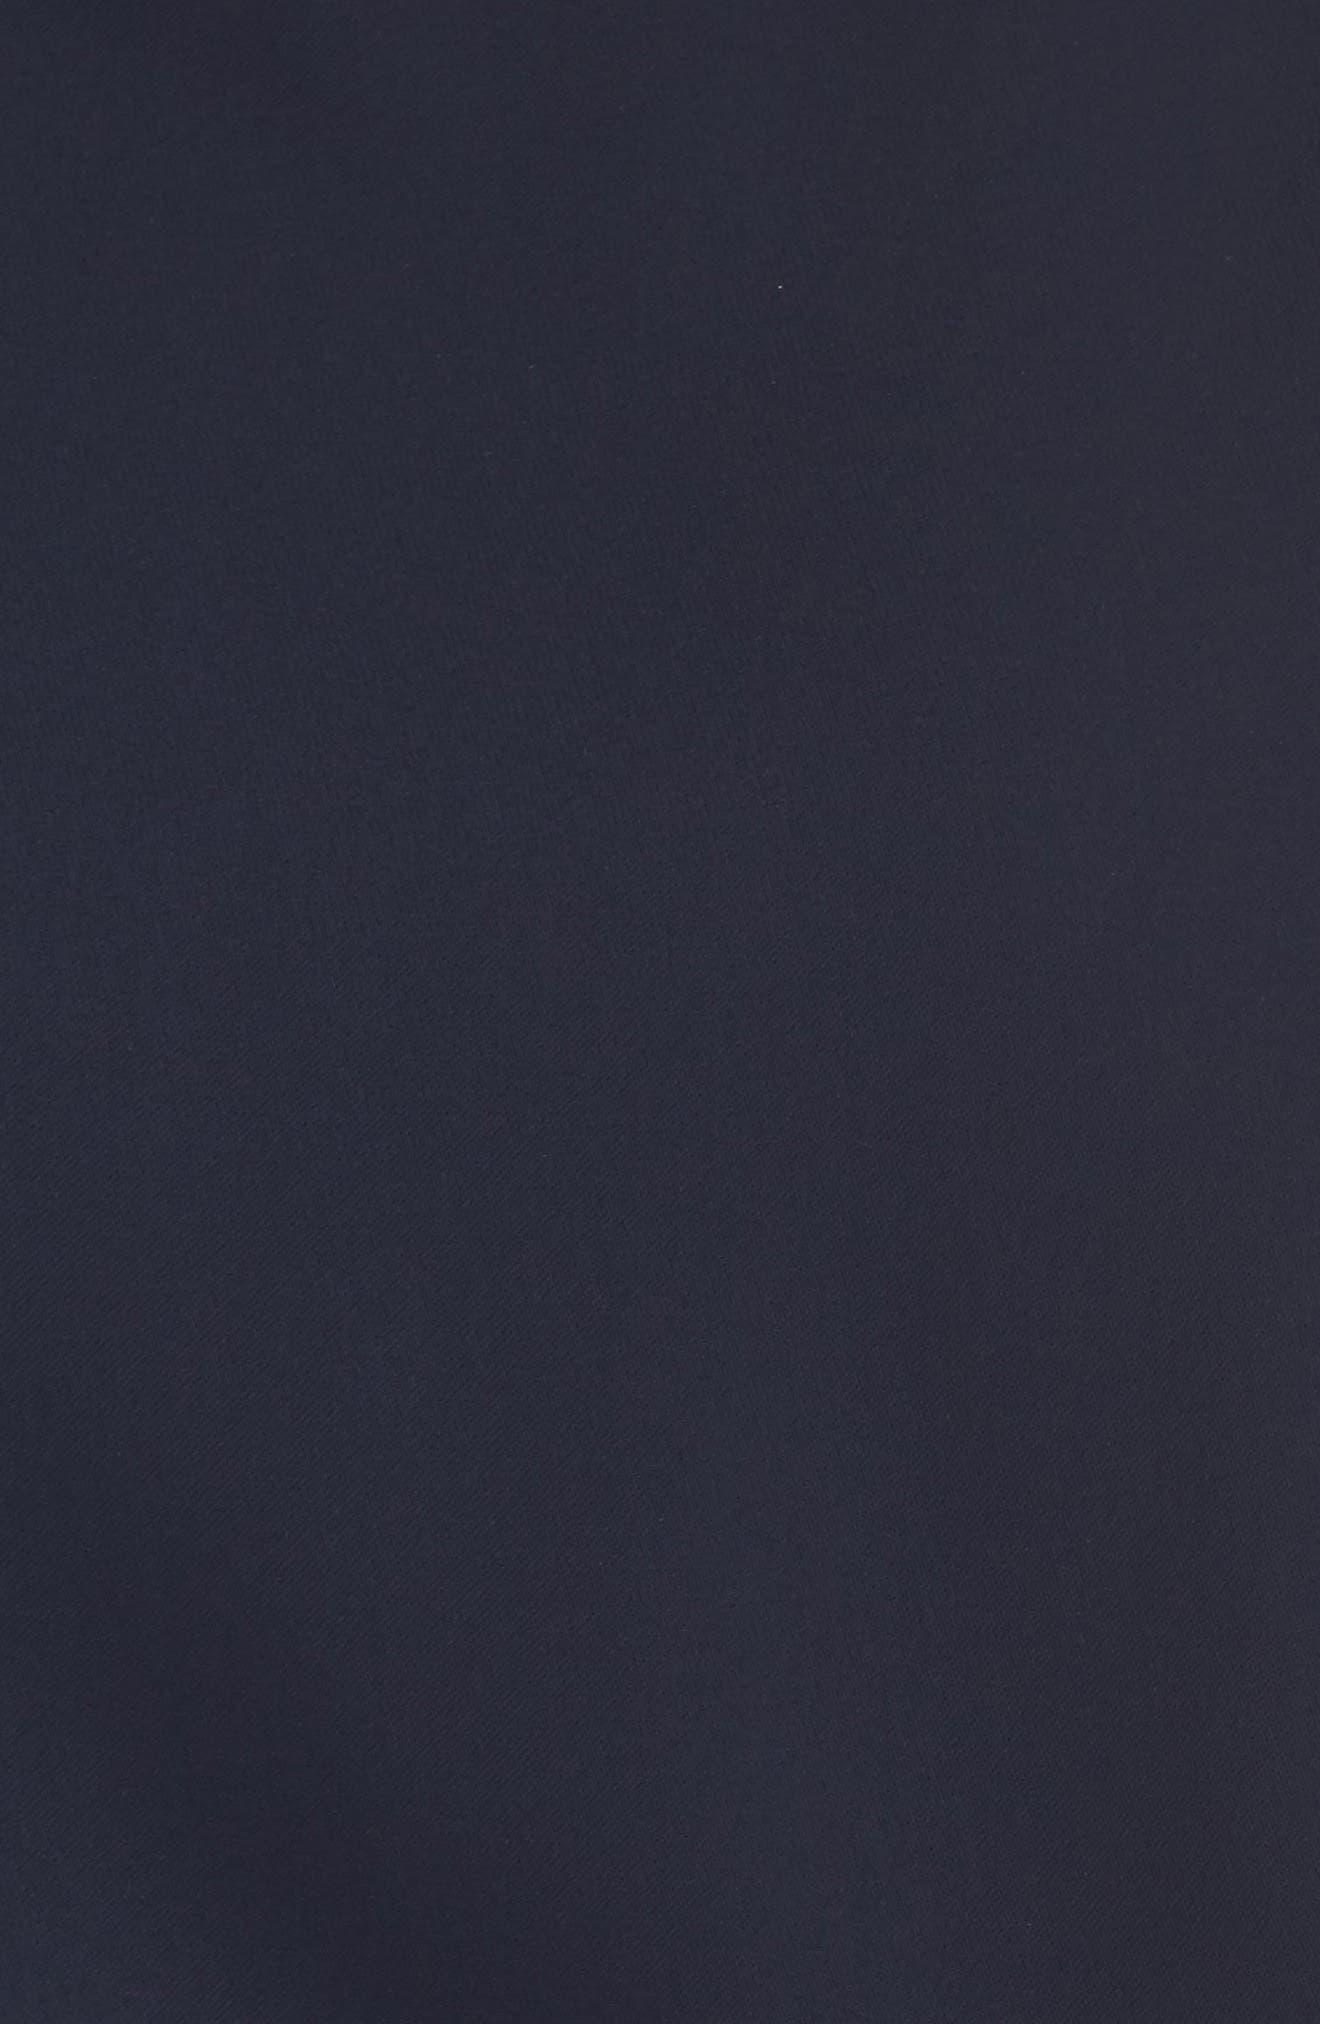 Cap Sleeve Crepe Jumpsuit,                             Alternate thumbnail 5, color,                             NAVY